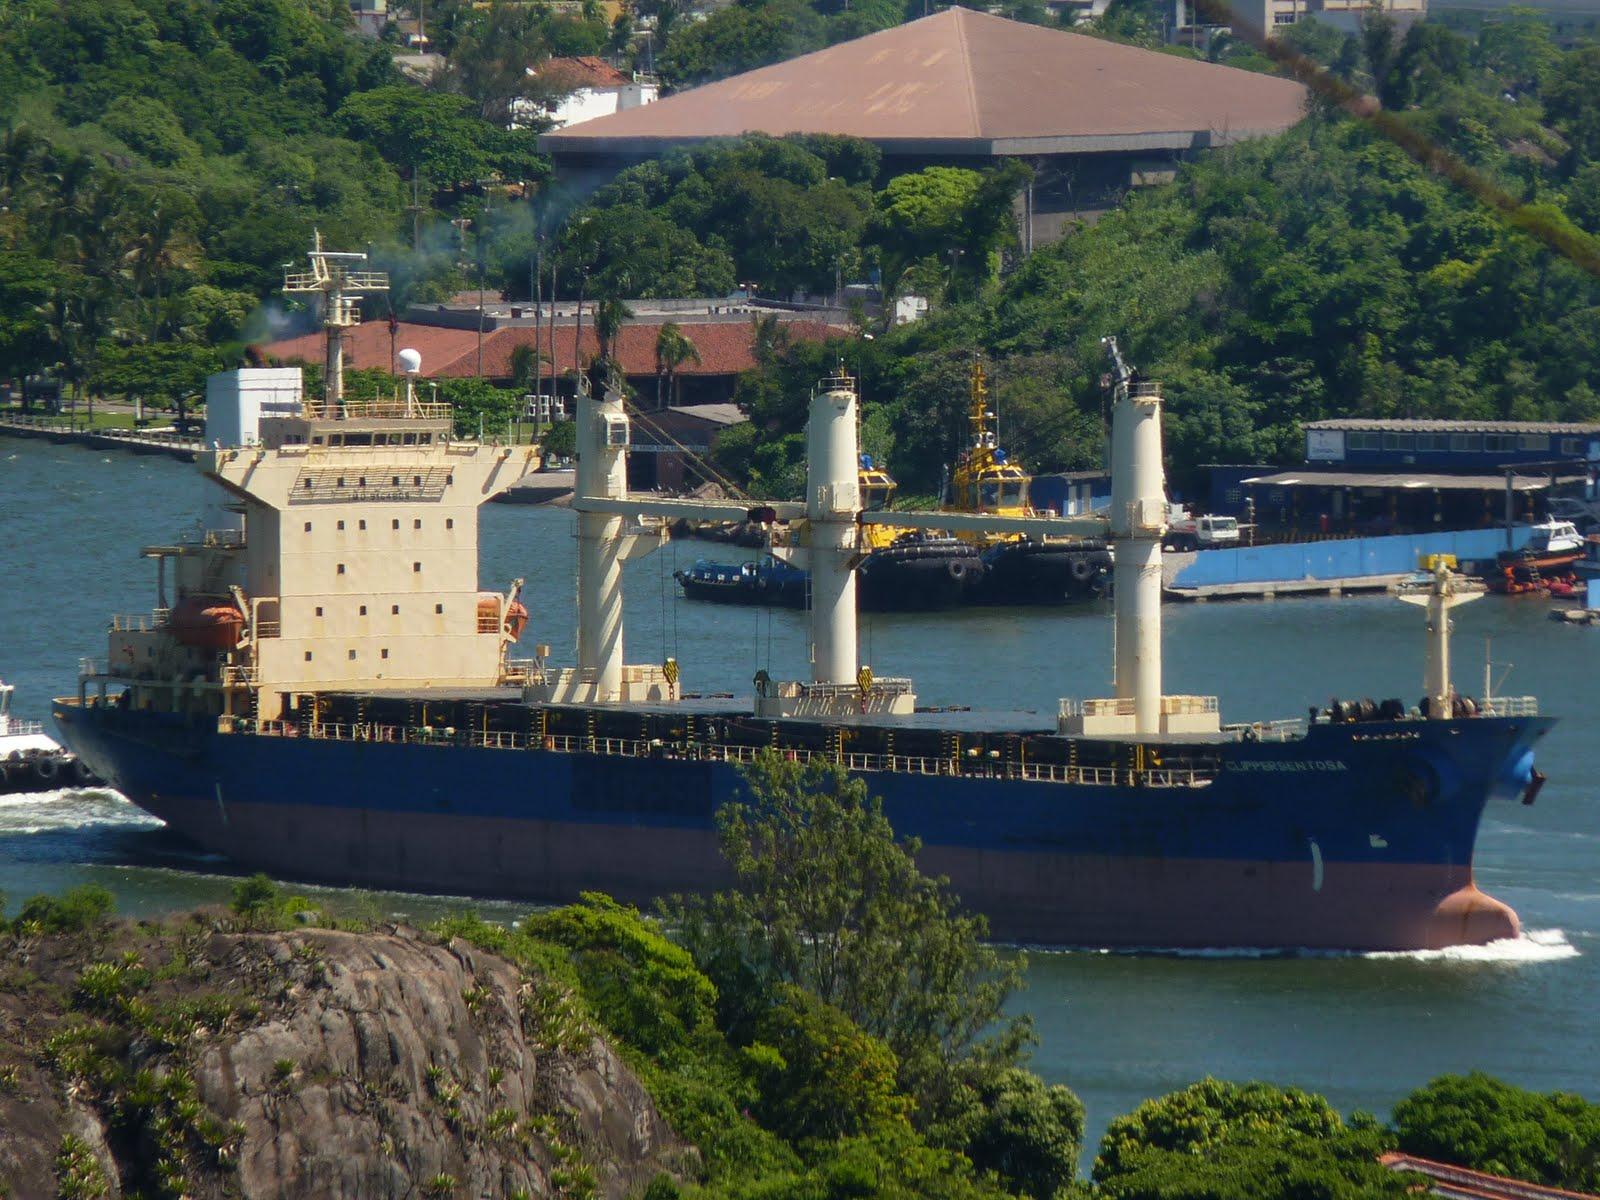 Ships calls Vitoria: One ship two names   08/04